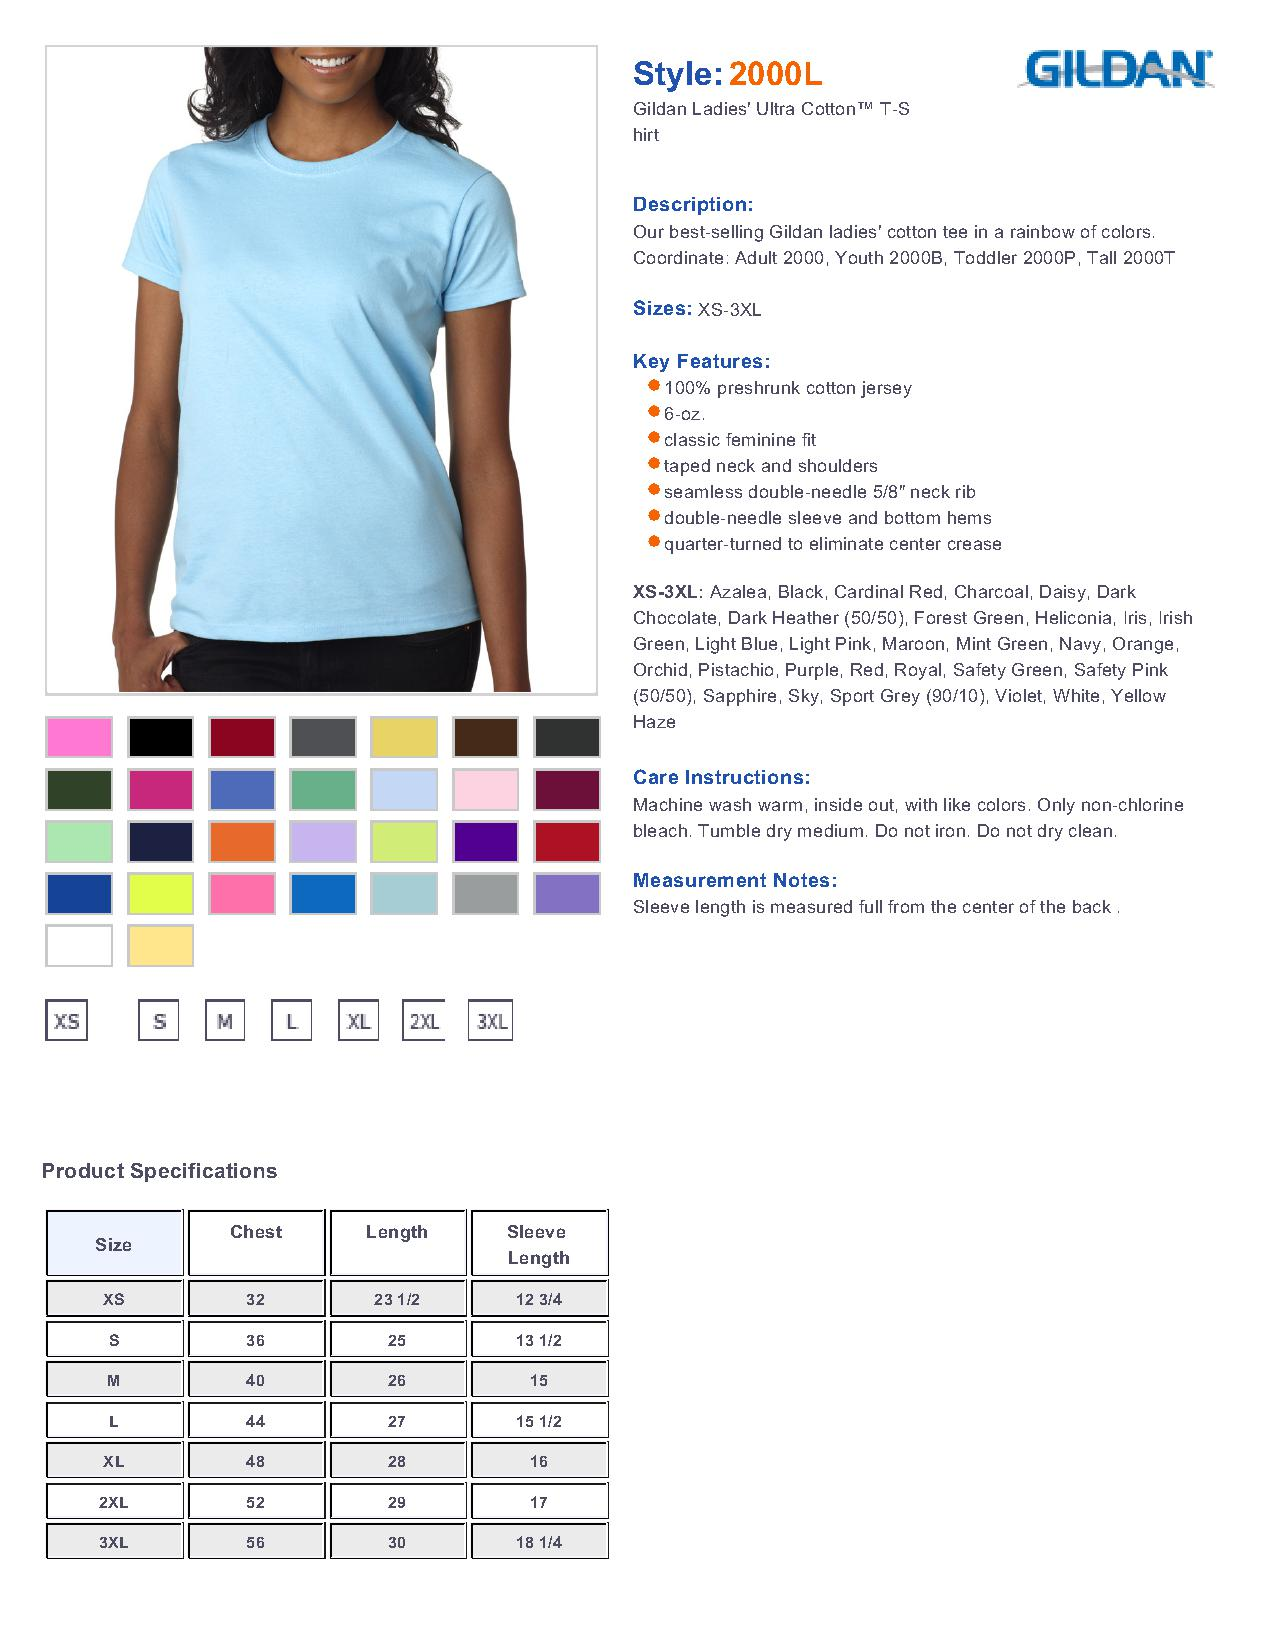 gildan ultra cotton ladies t shirt size chart gildan